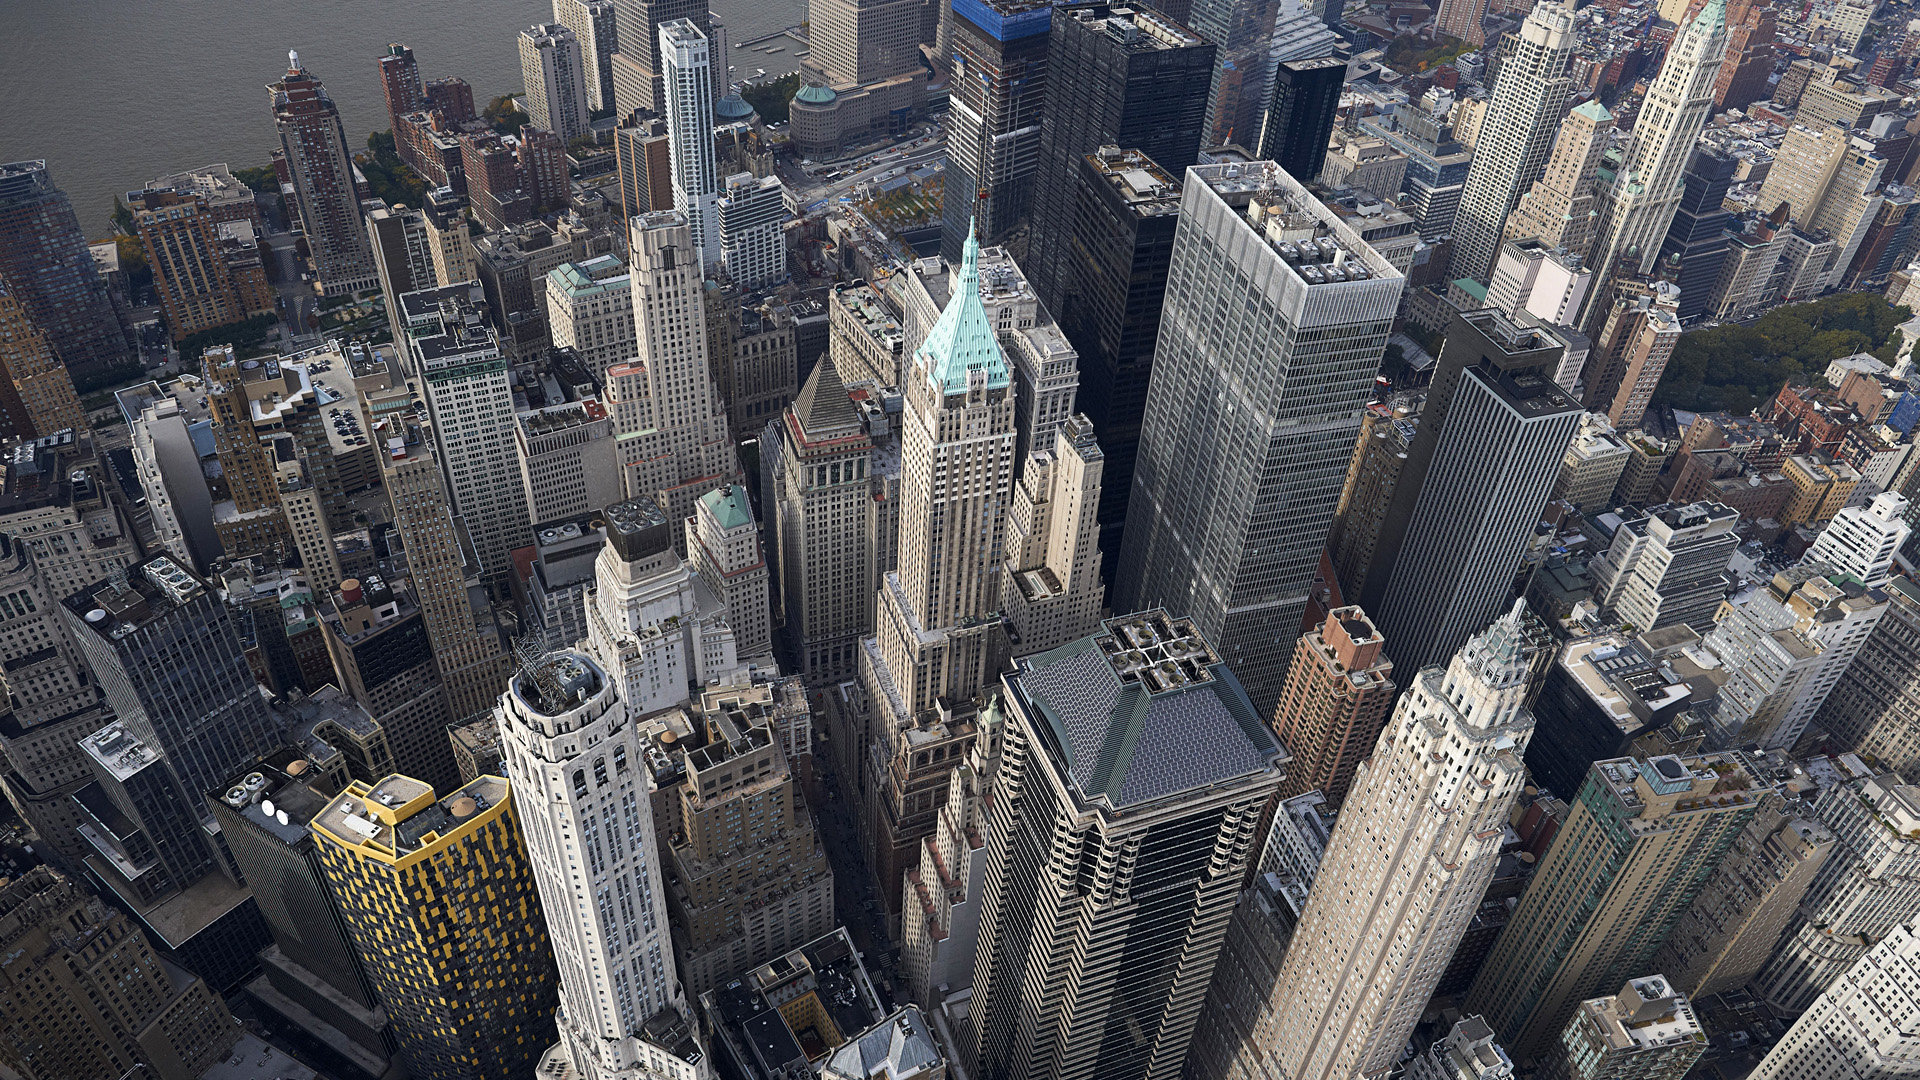 High Resolution New York Full Hd 1920x1080 Wallpaper Id